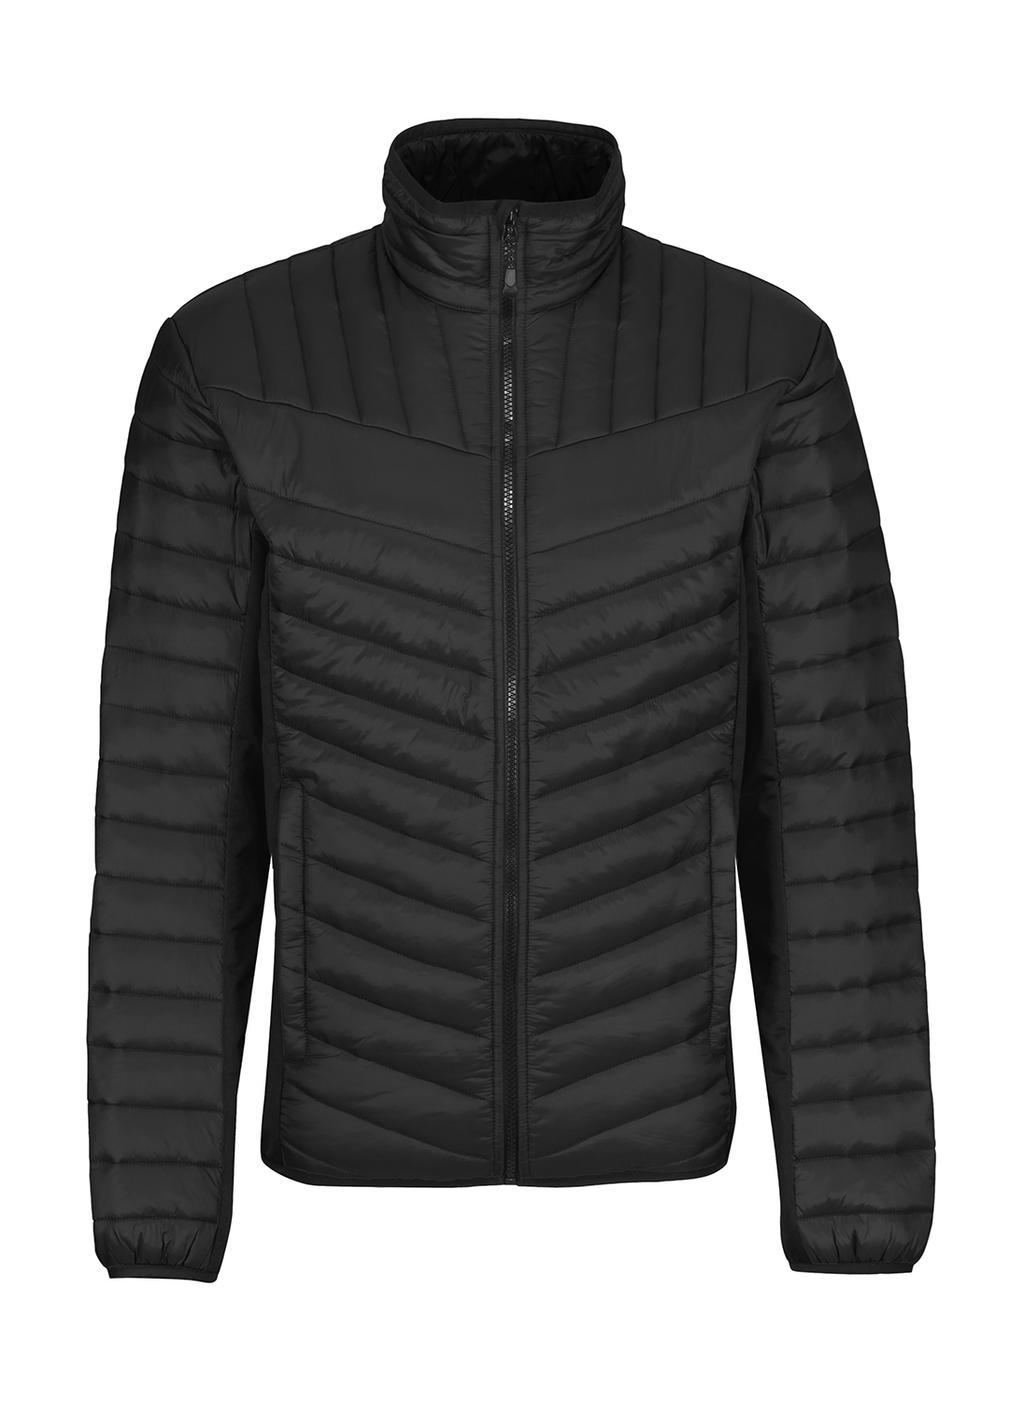 Tourer Hybrid Jacket